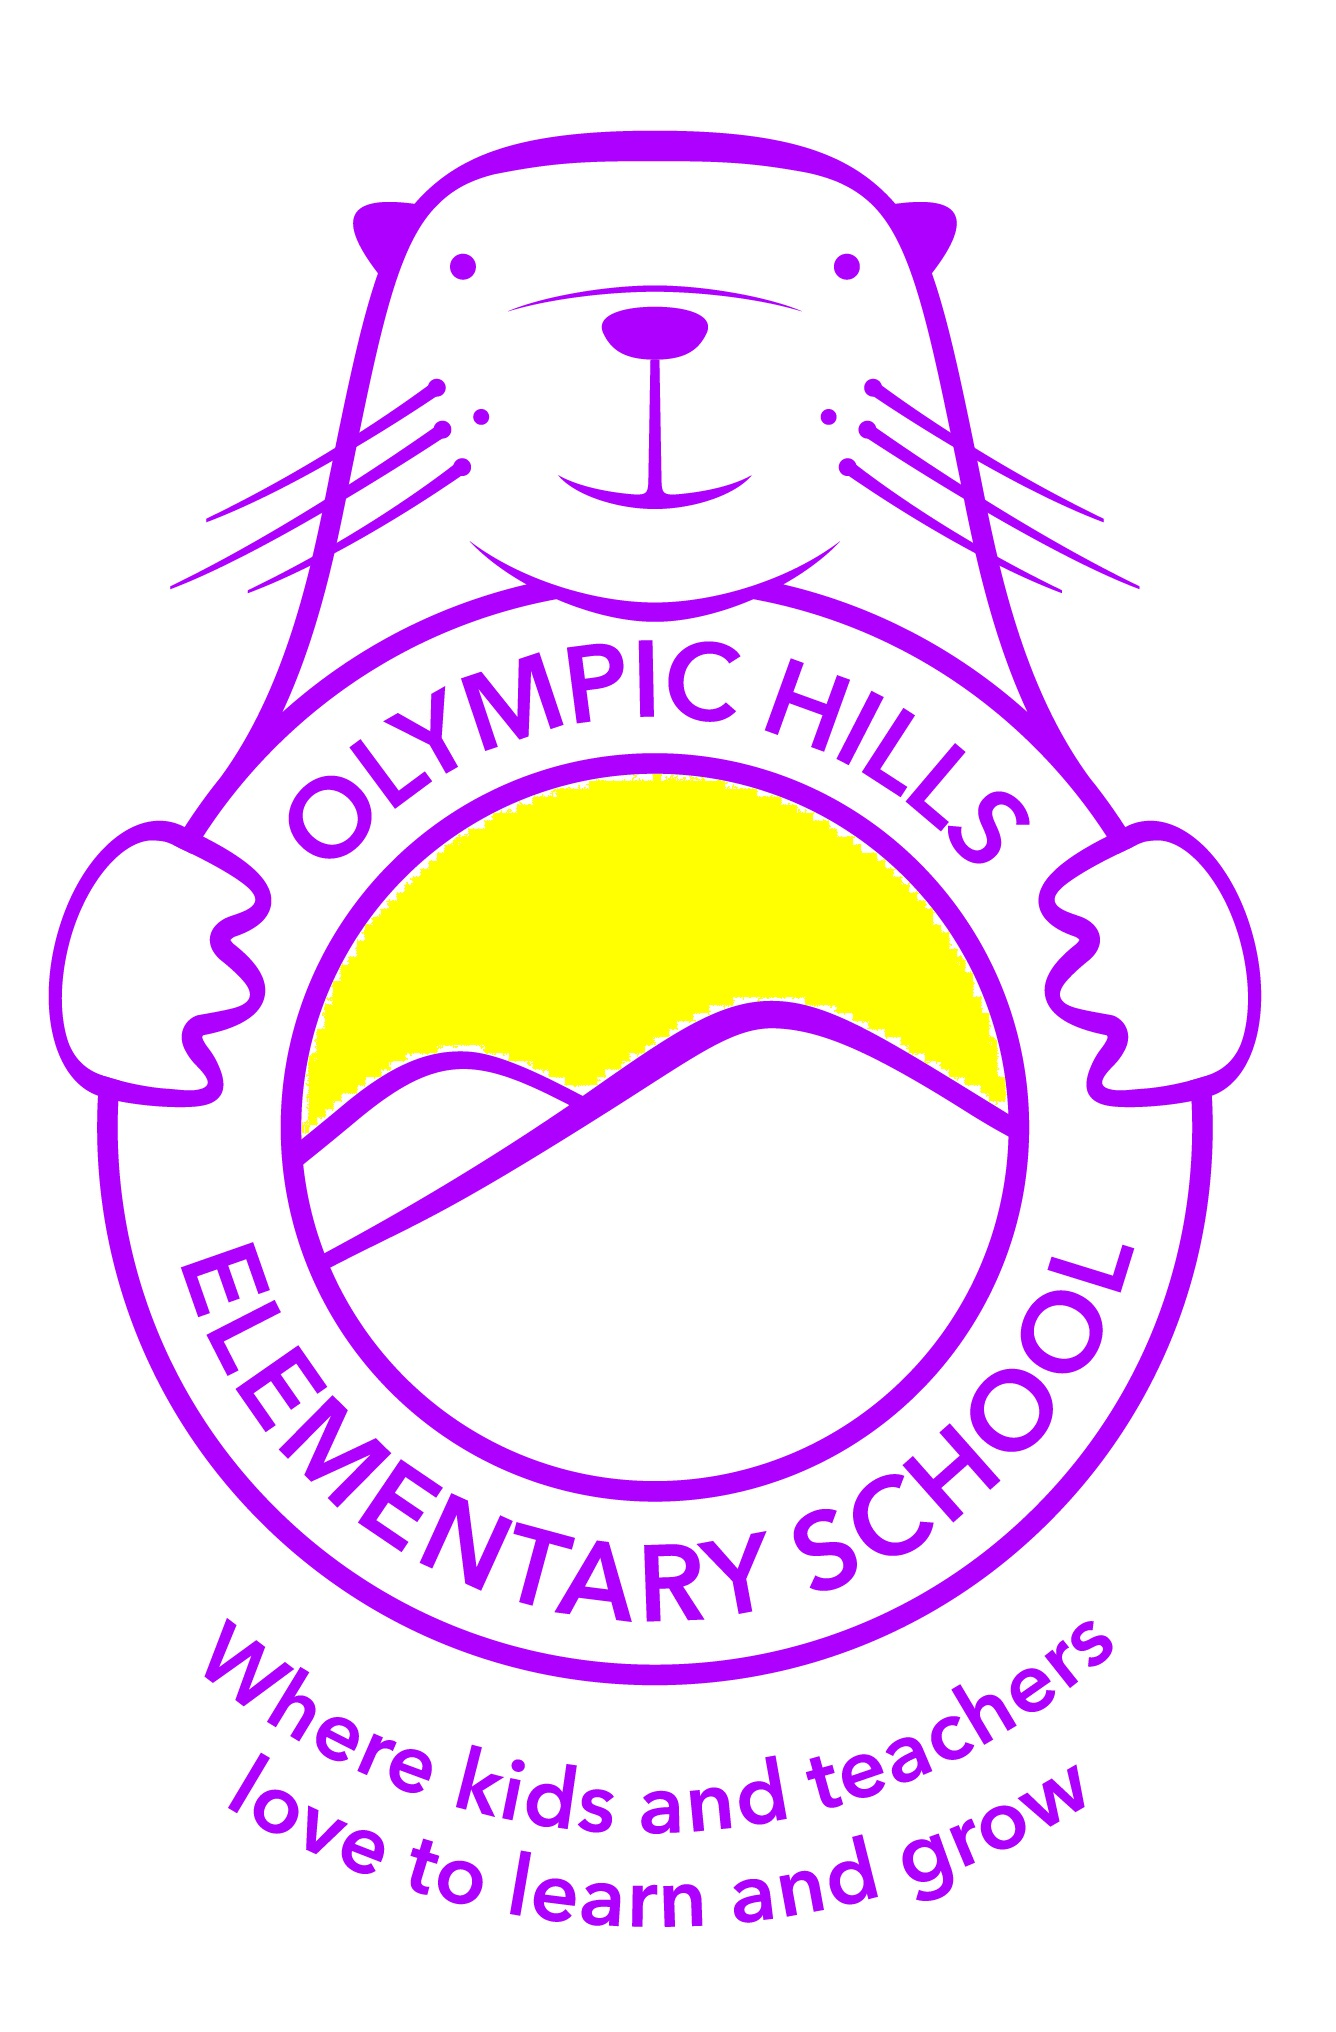 Olympic Hills Elementary